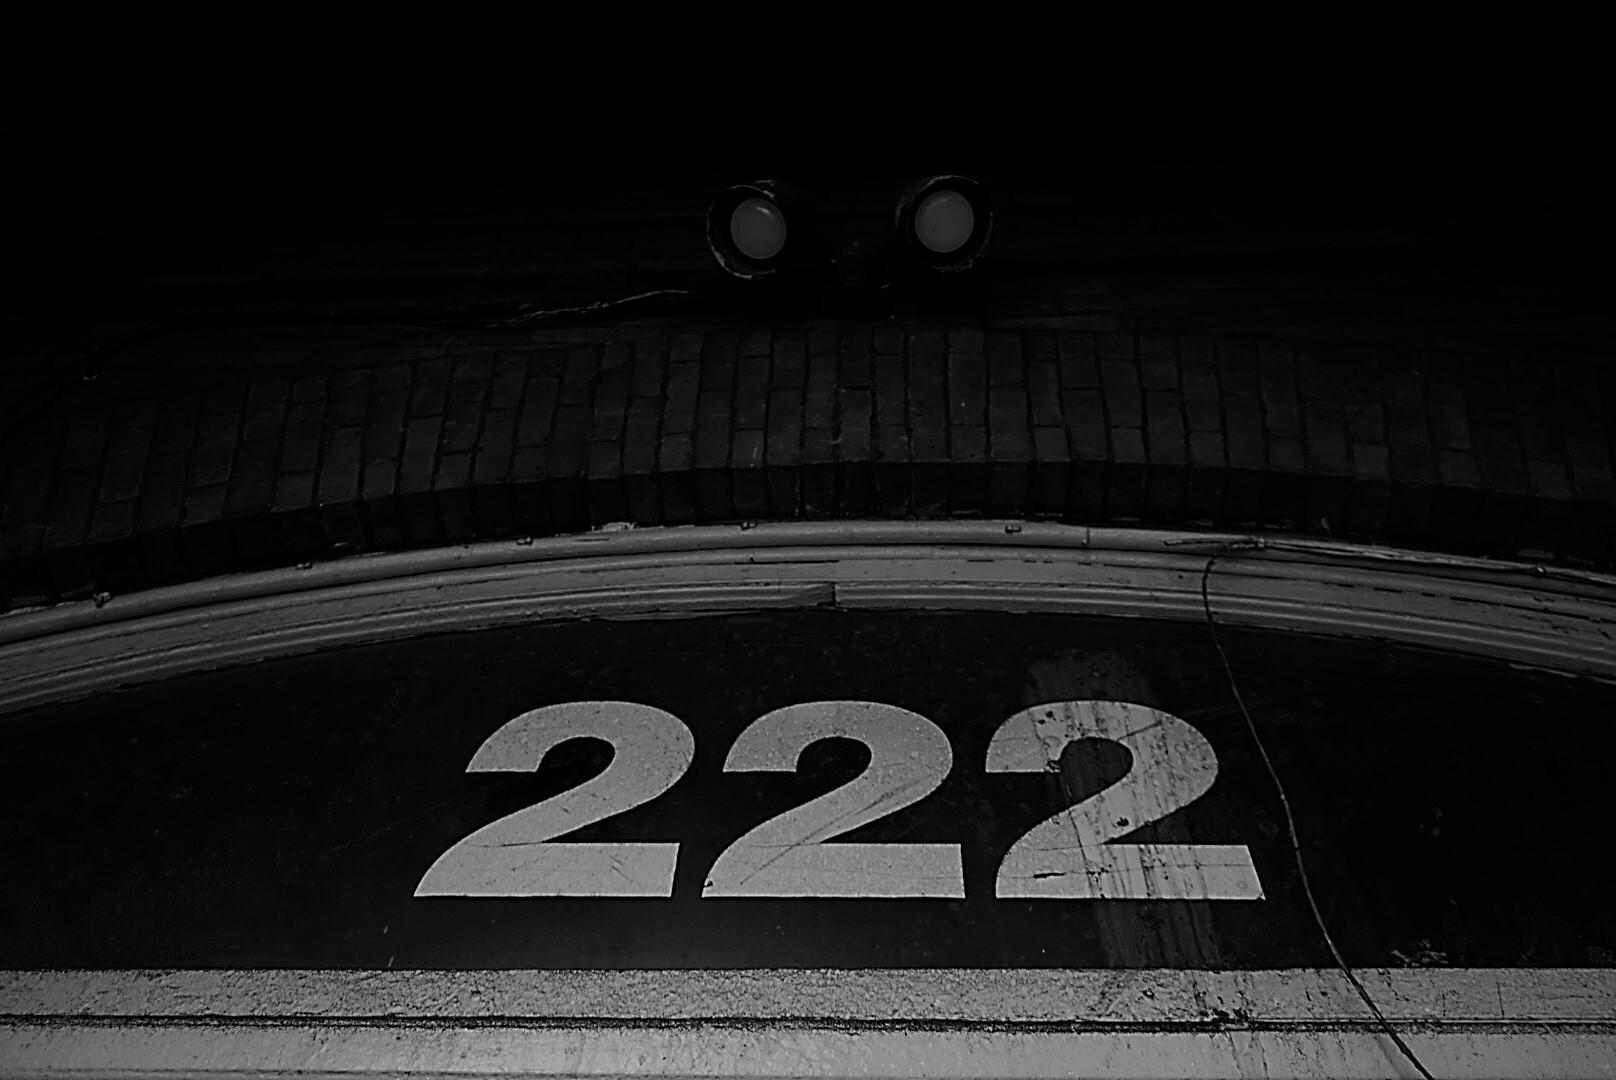 222 bowey sign.jpg